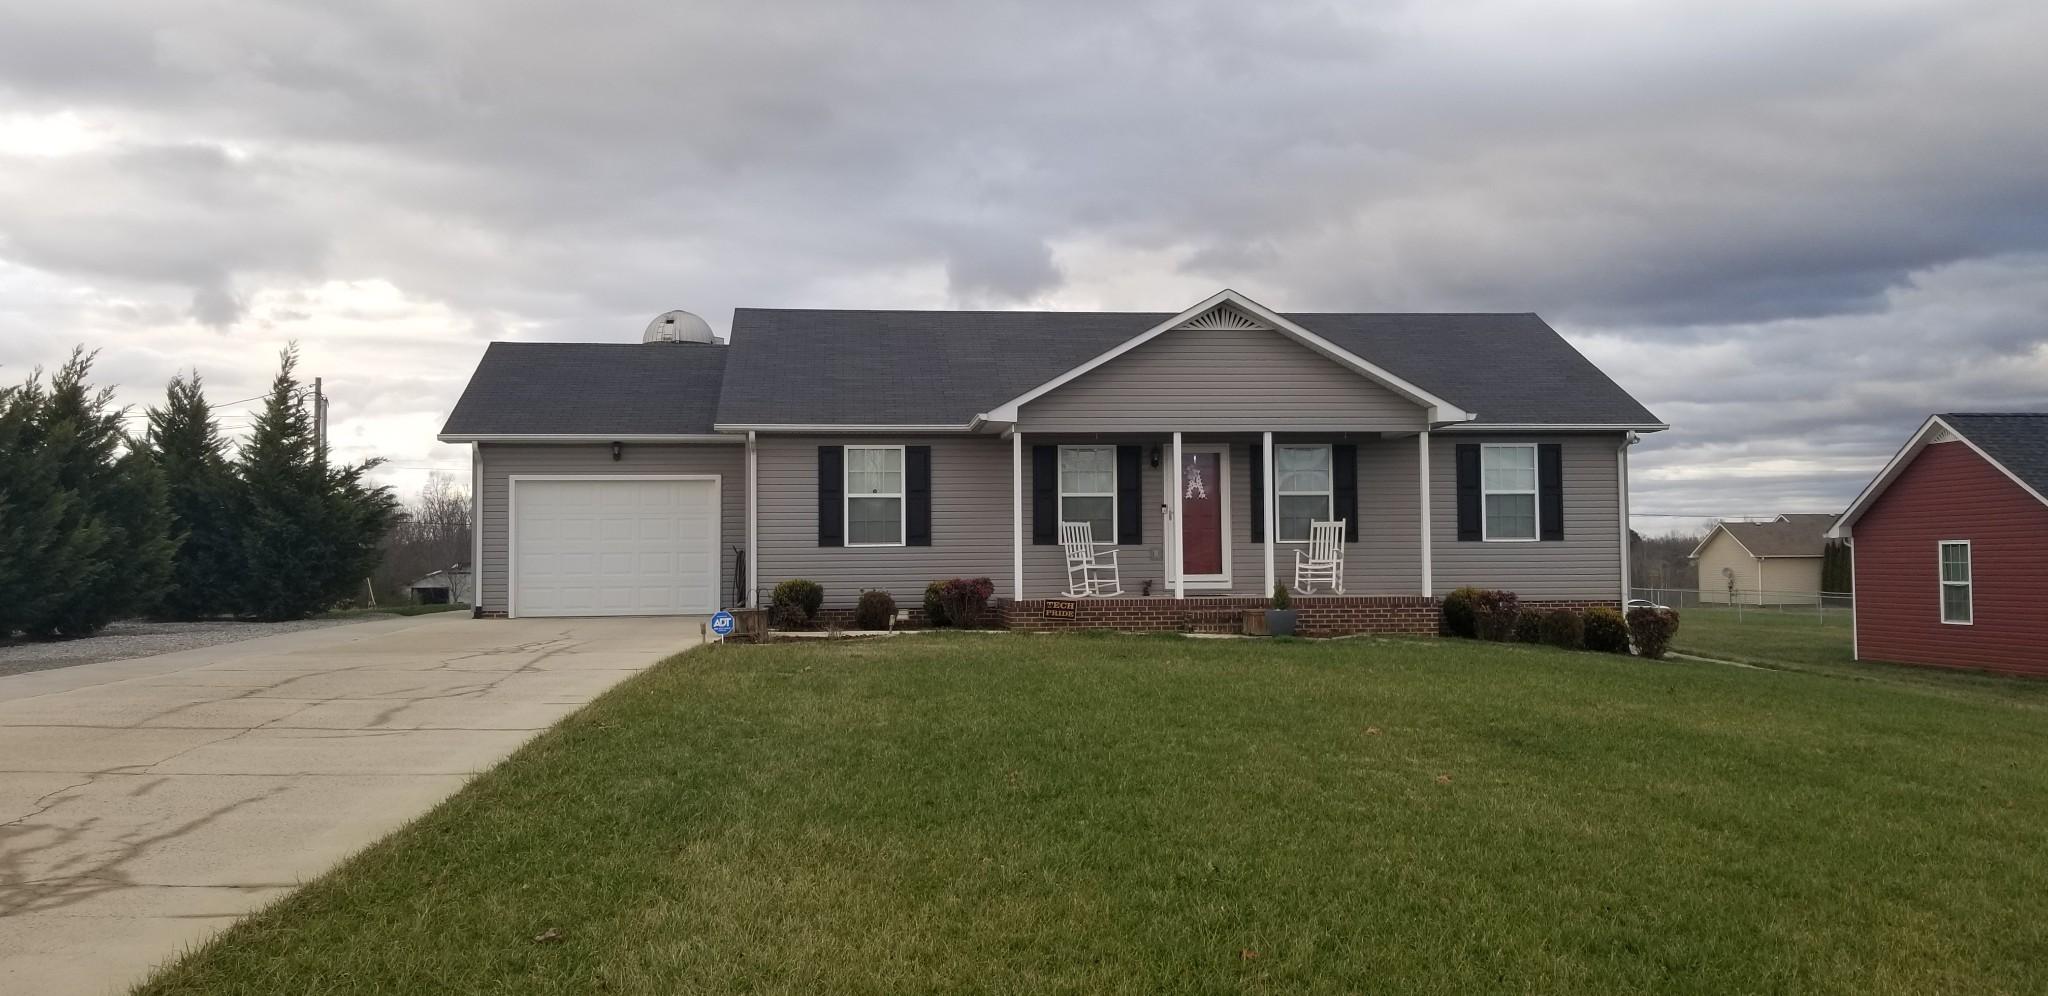 4520 Ewing Dr, Baxter, TN 38544 - Baxter, TN real estate listing